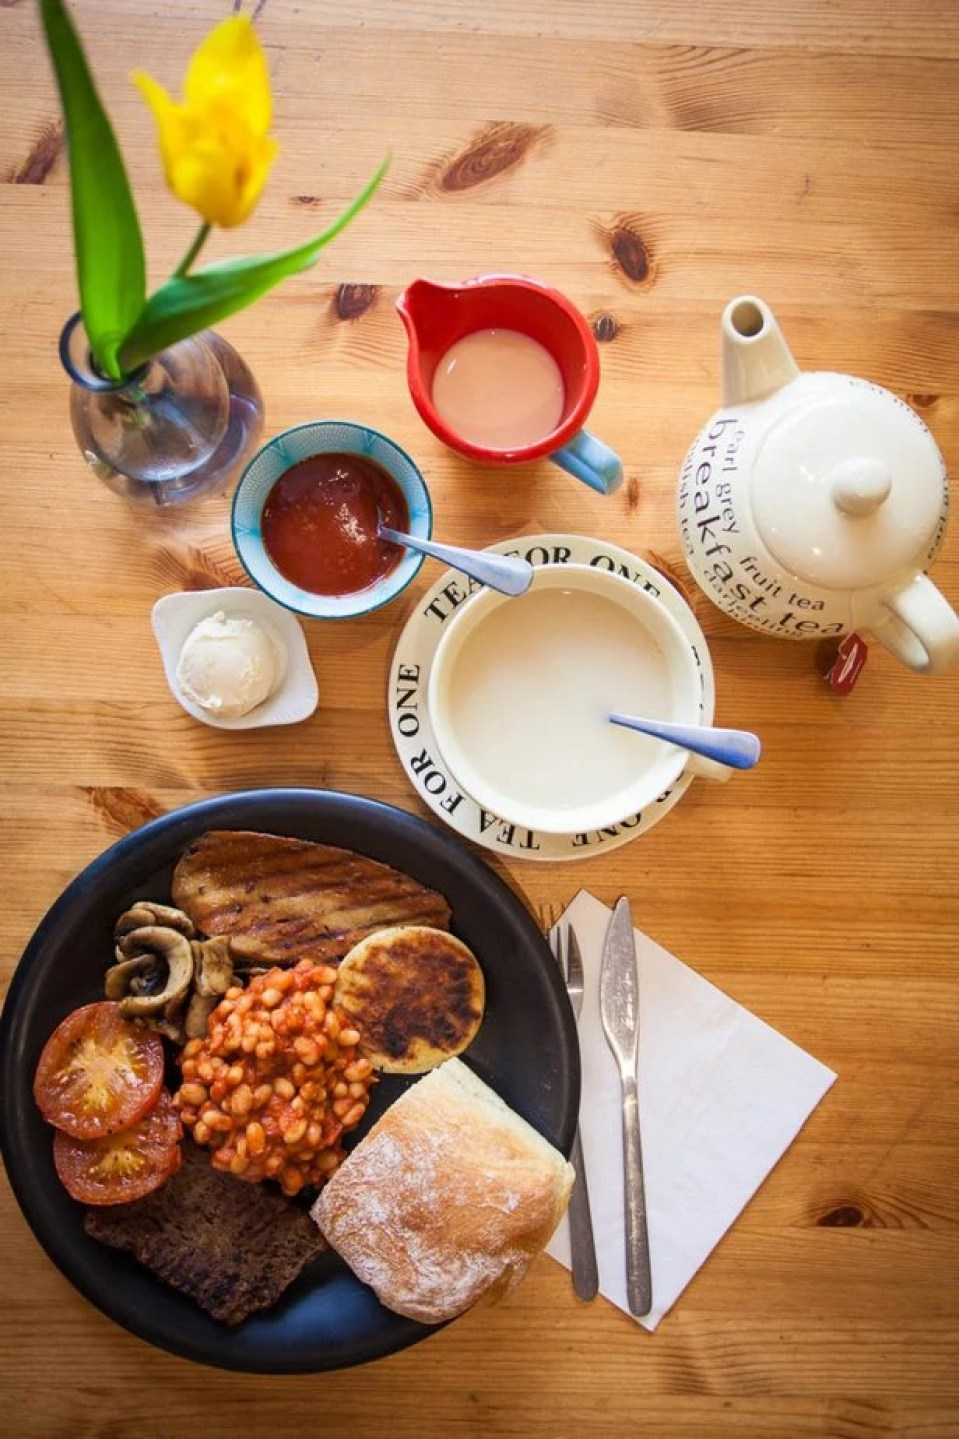 Vegan Breakfast at Glasgow Cafe in Glasgow